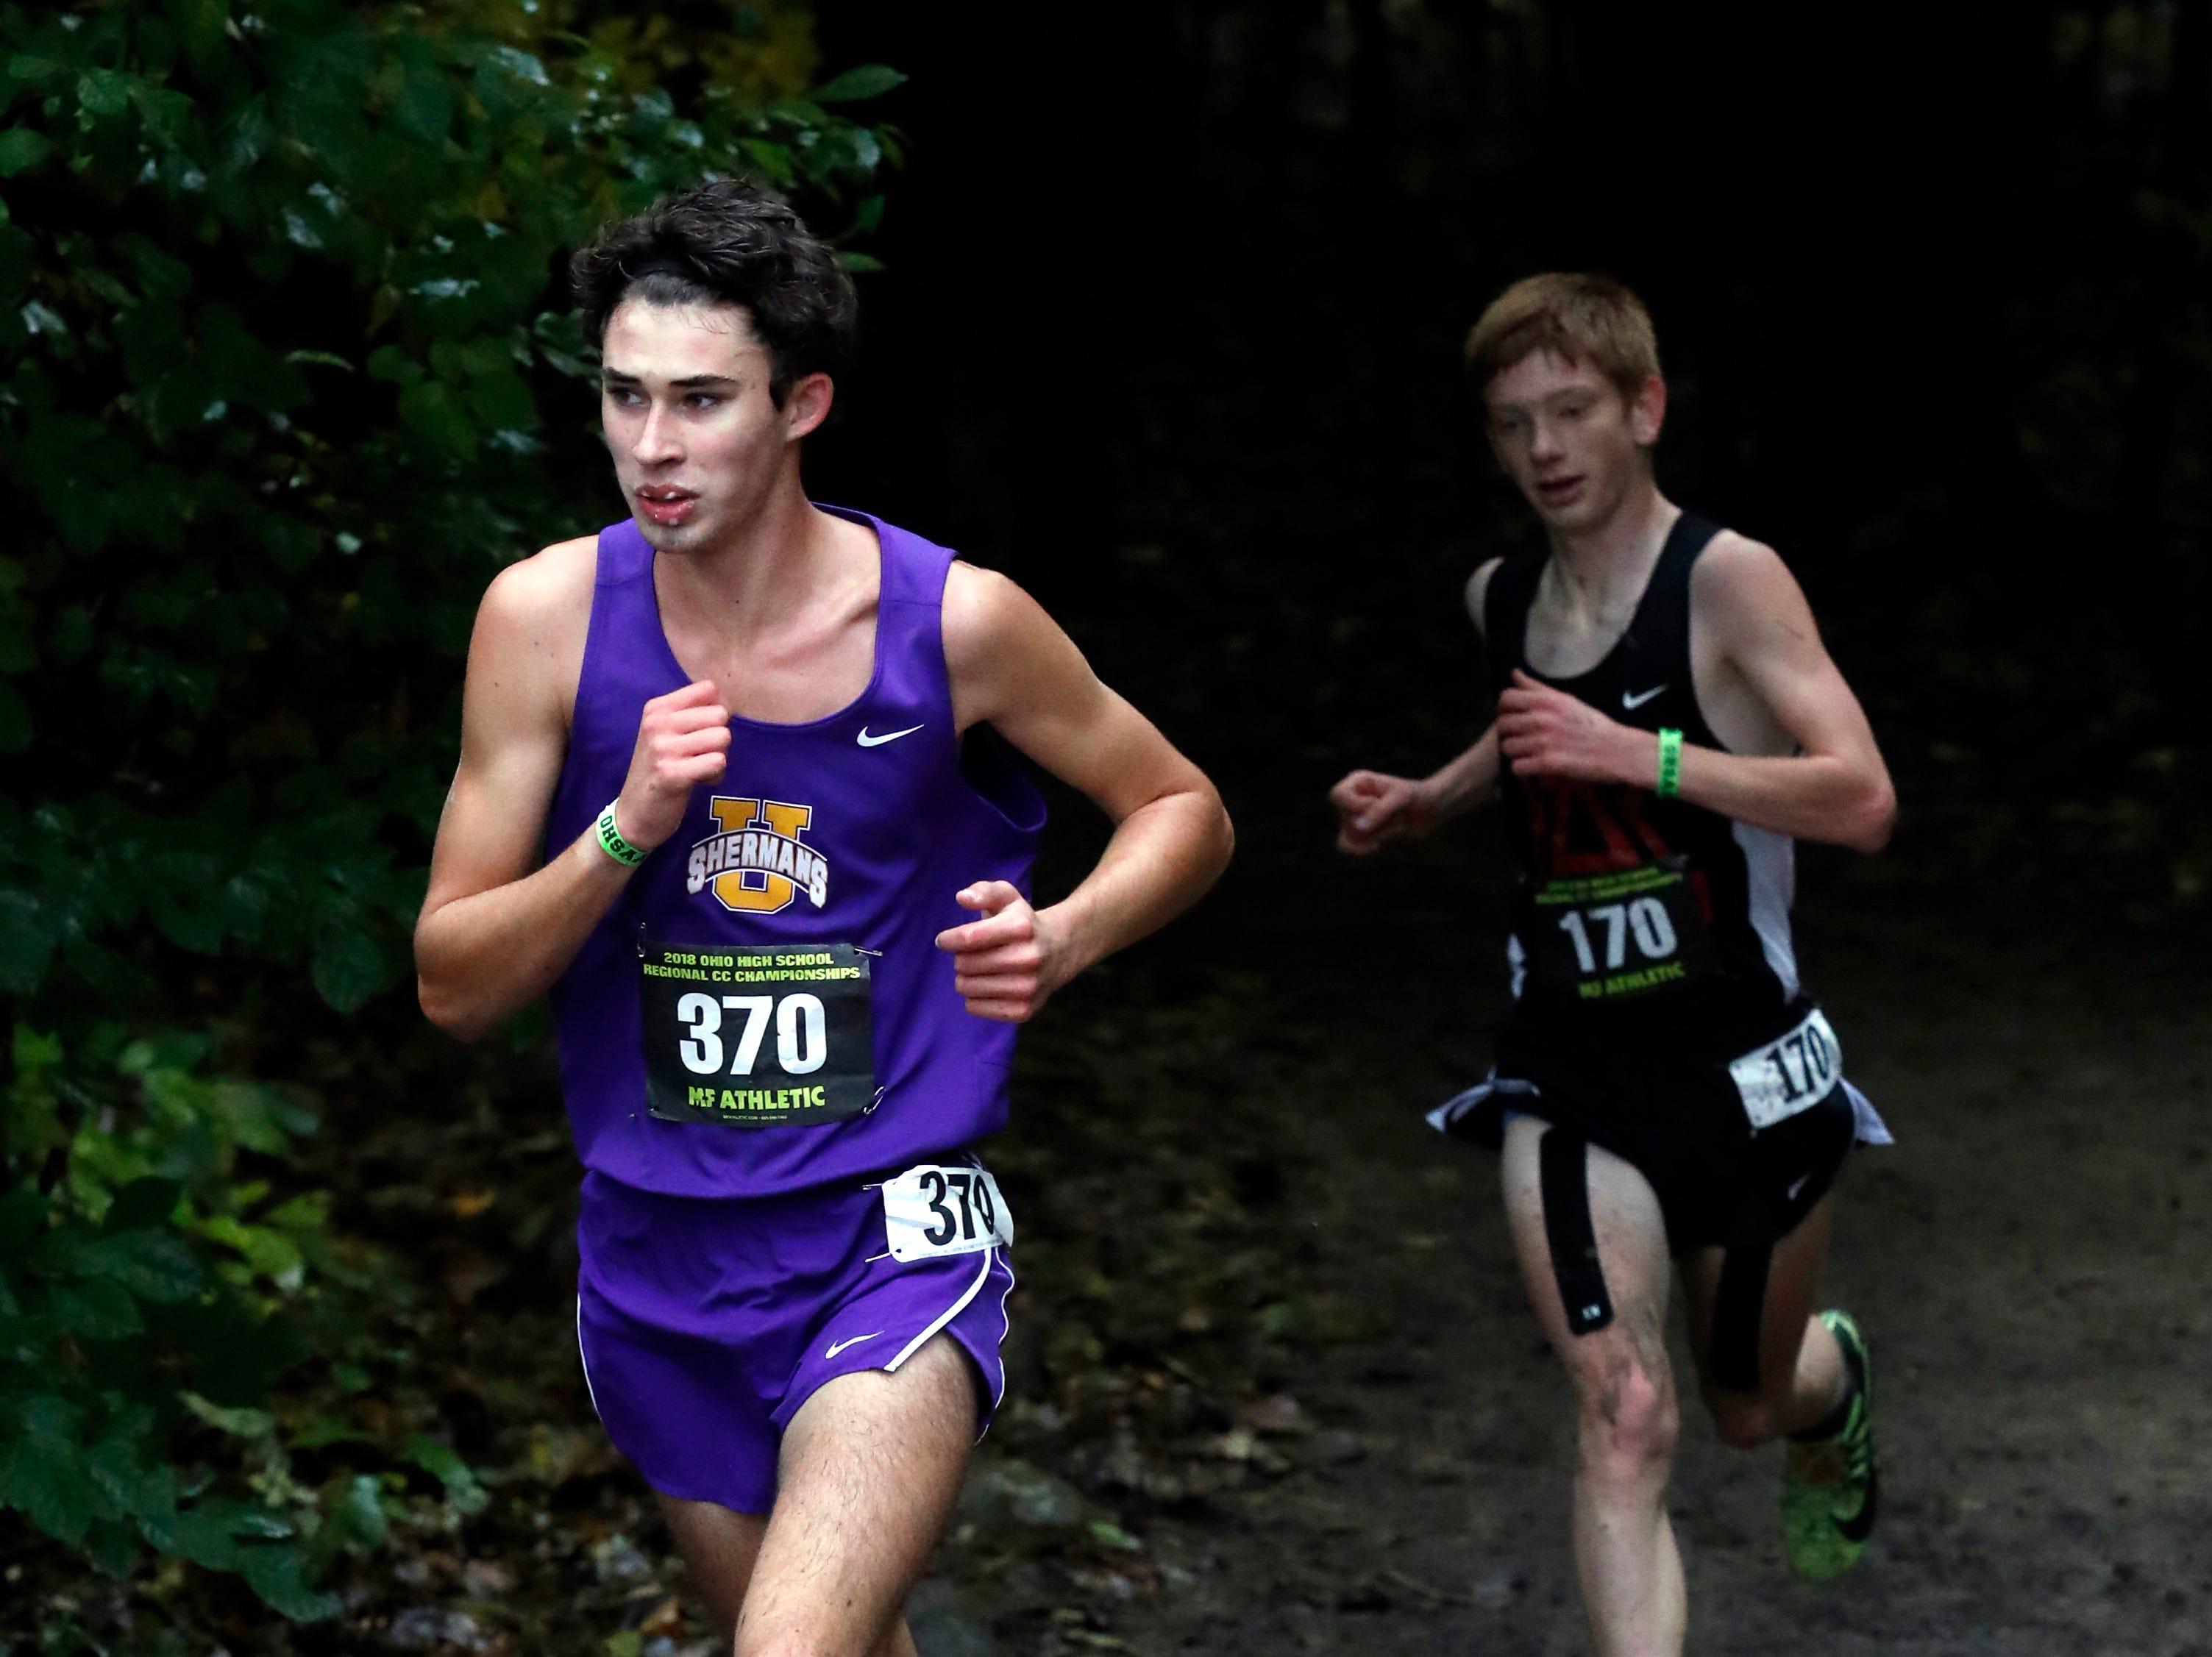 Unioto's Jaden Watkins runs in the Regional Cross Country meet Saturday, Oct. 27, 2018, at Pickerington North High School in Pickerington.